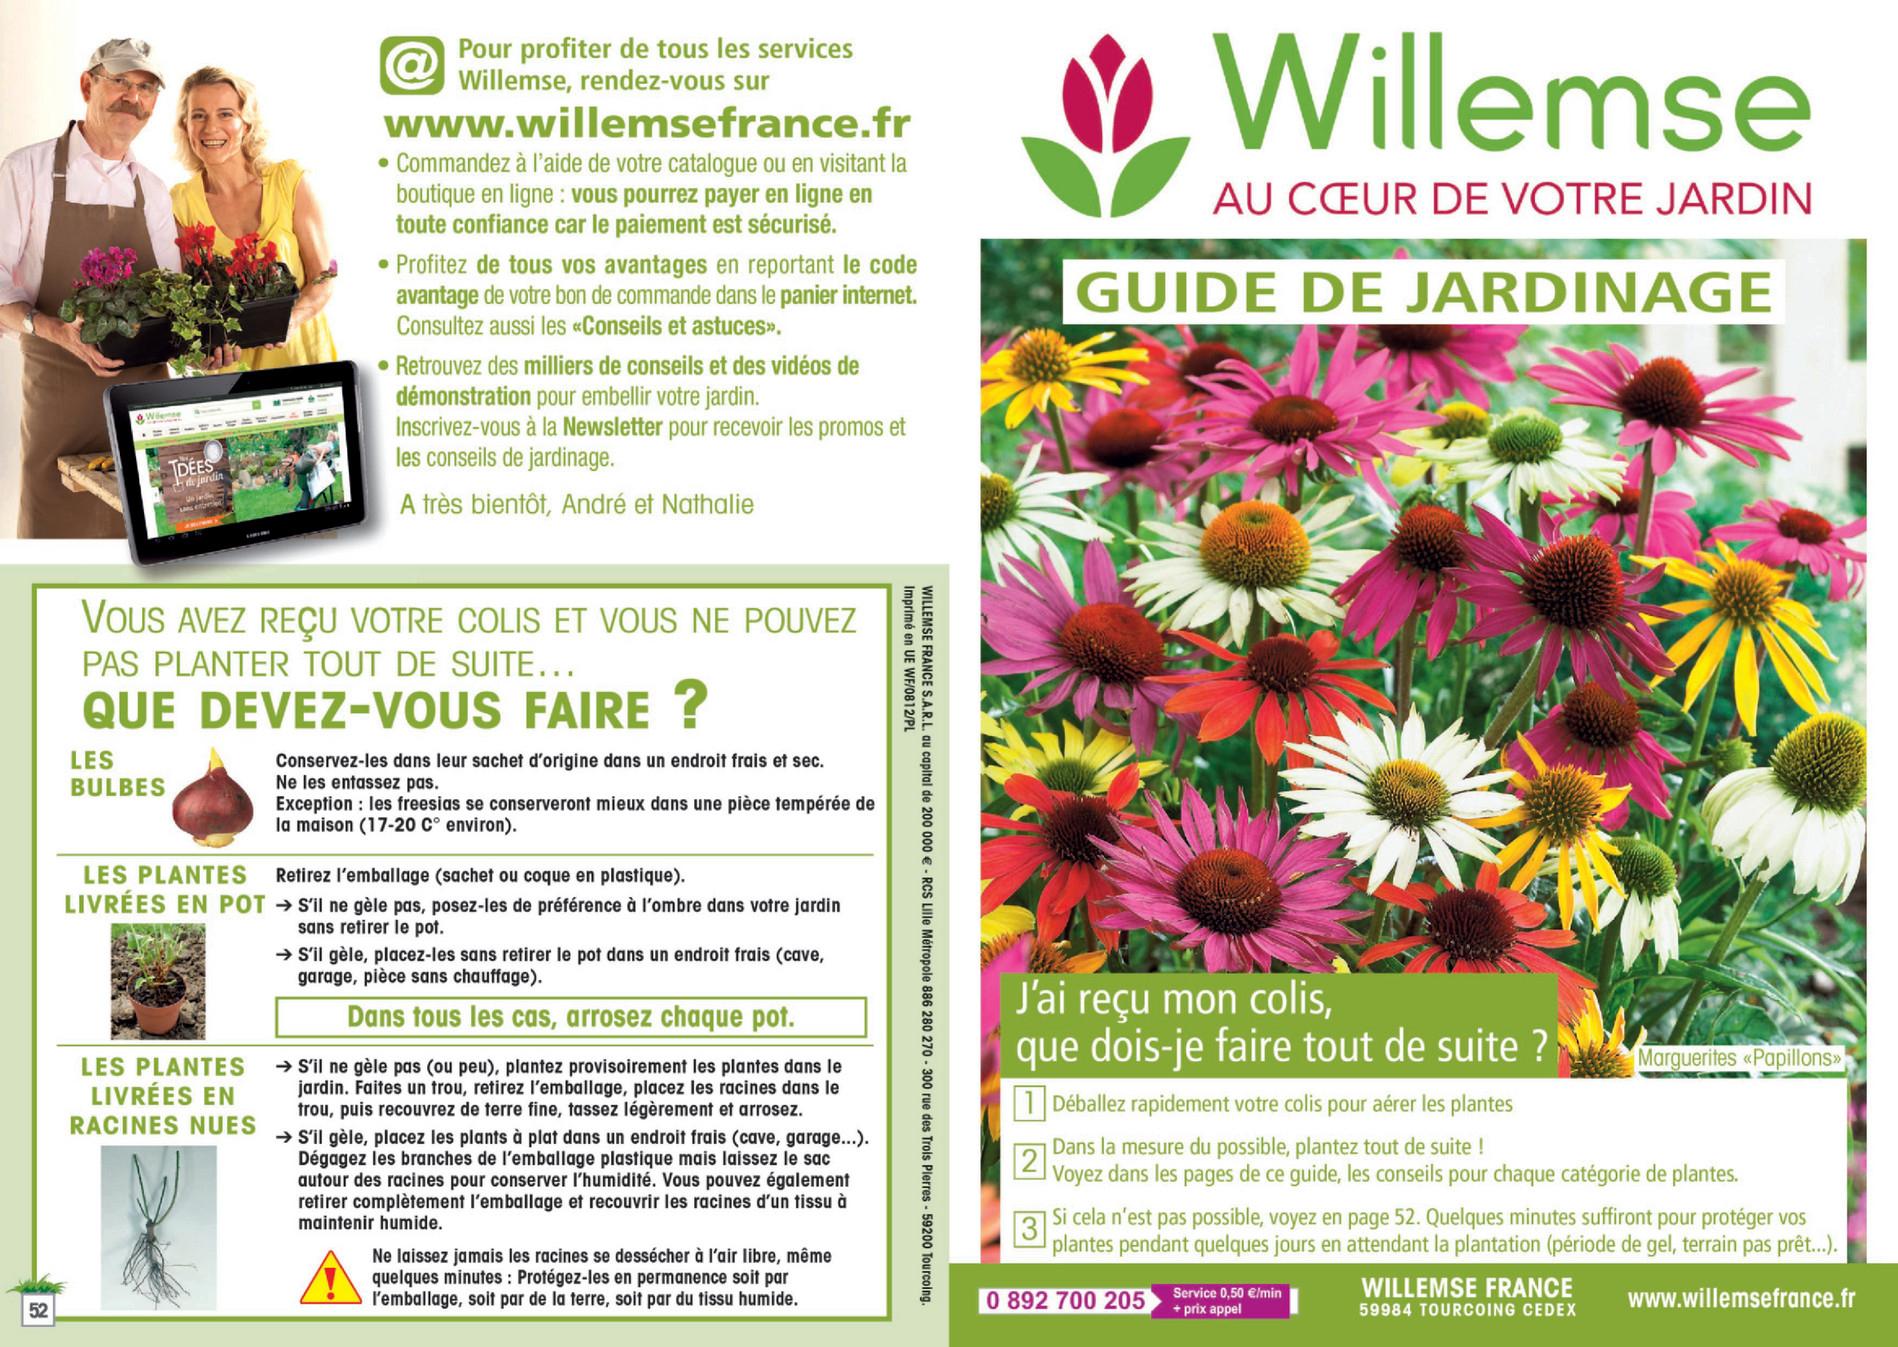 Willemse - Guide De Jardinage Willemse - Page 1 - Created ... tout Idee De Plantation Pour Jardin